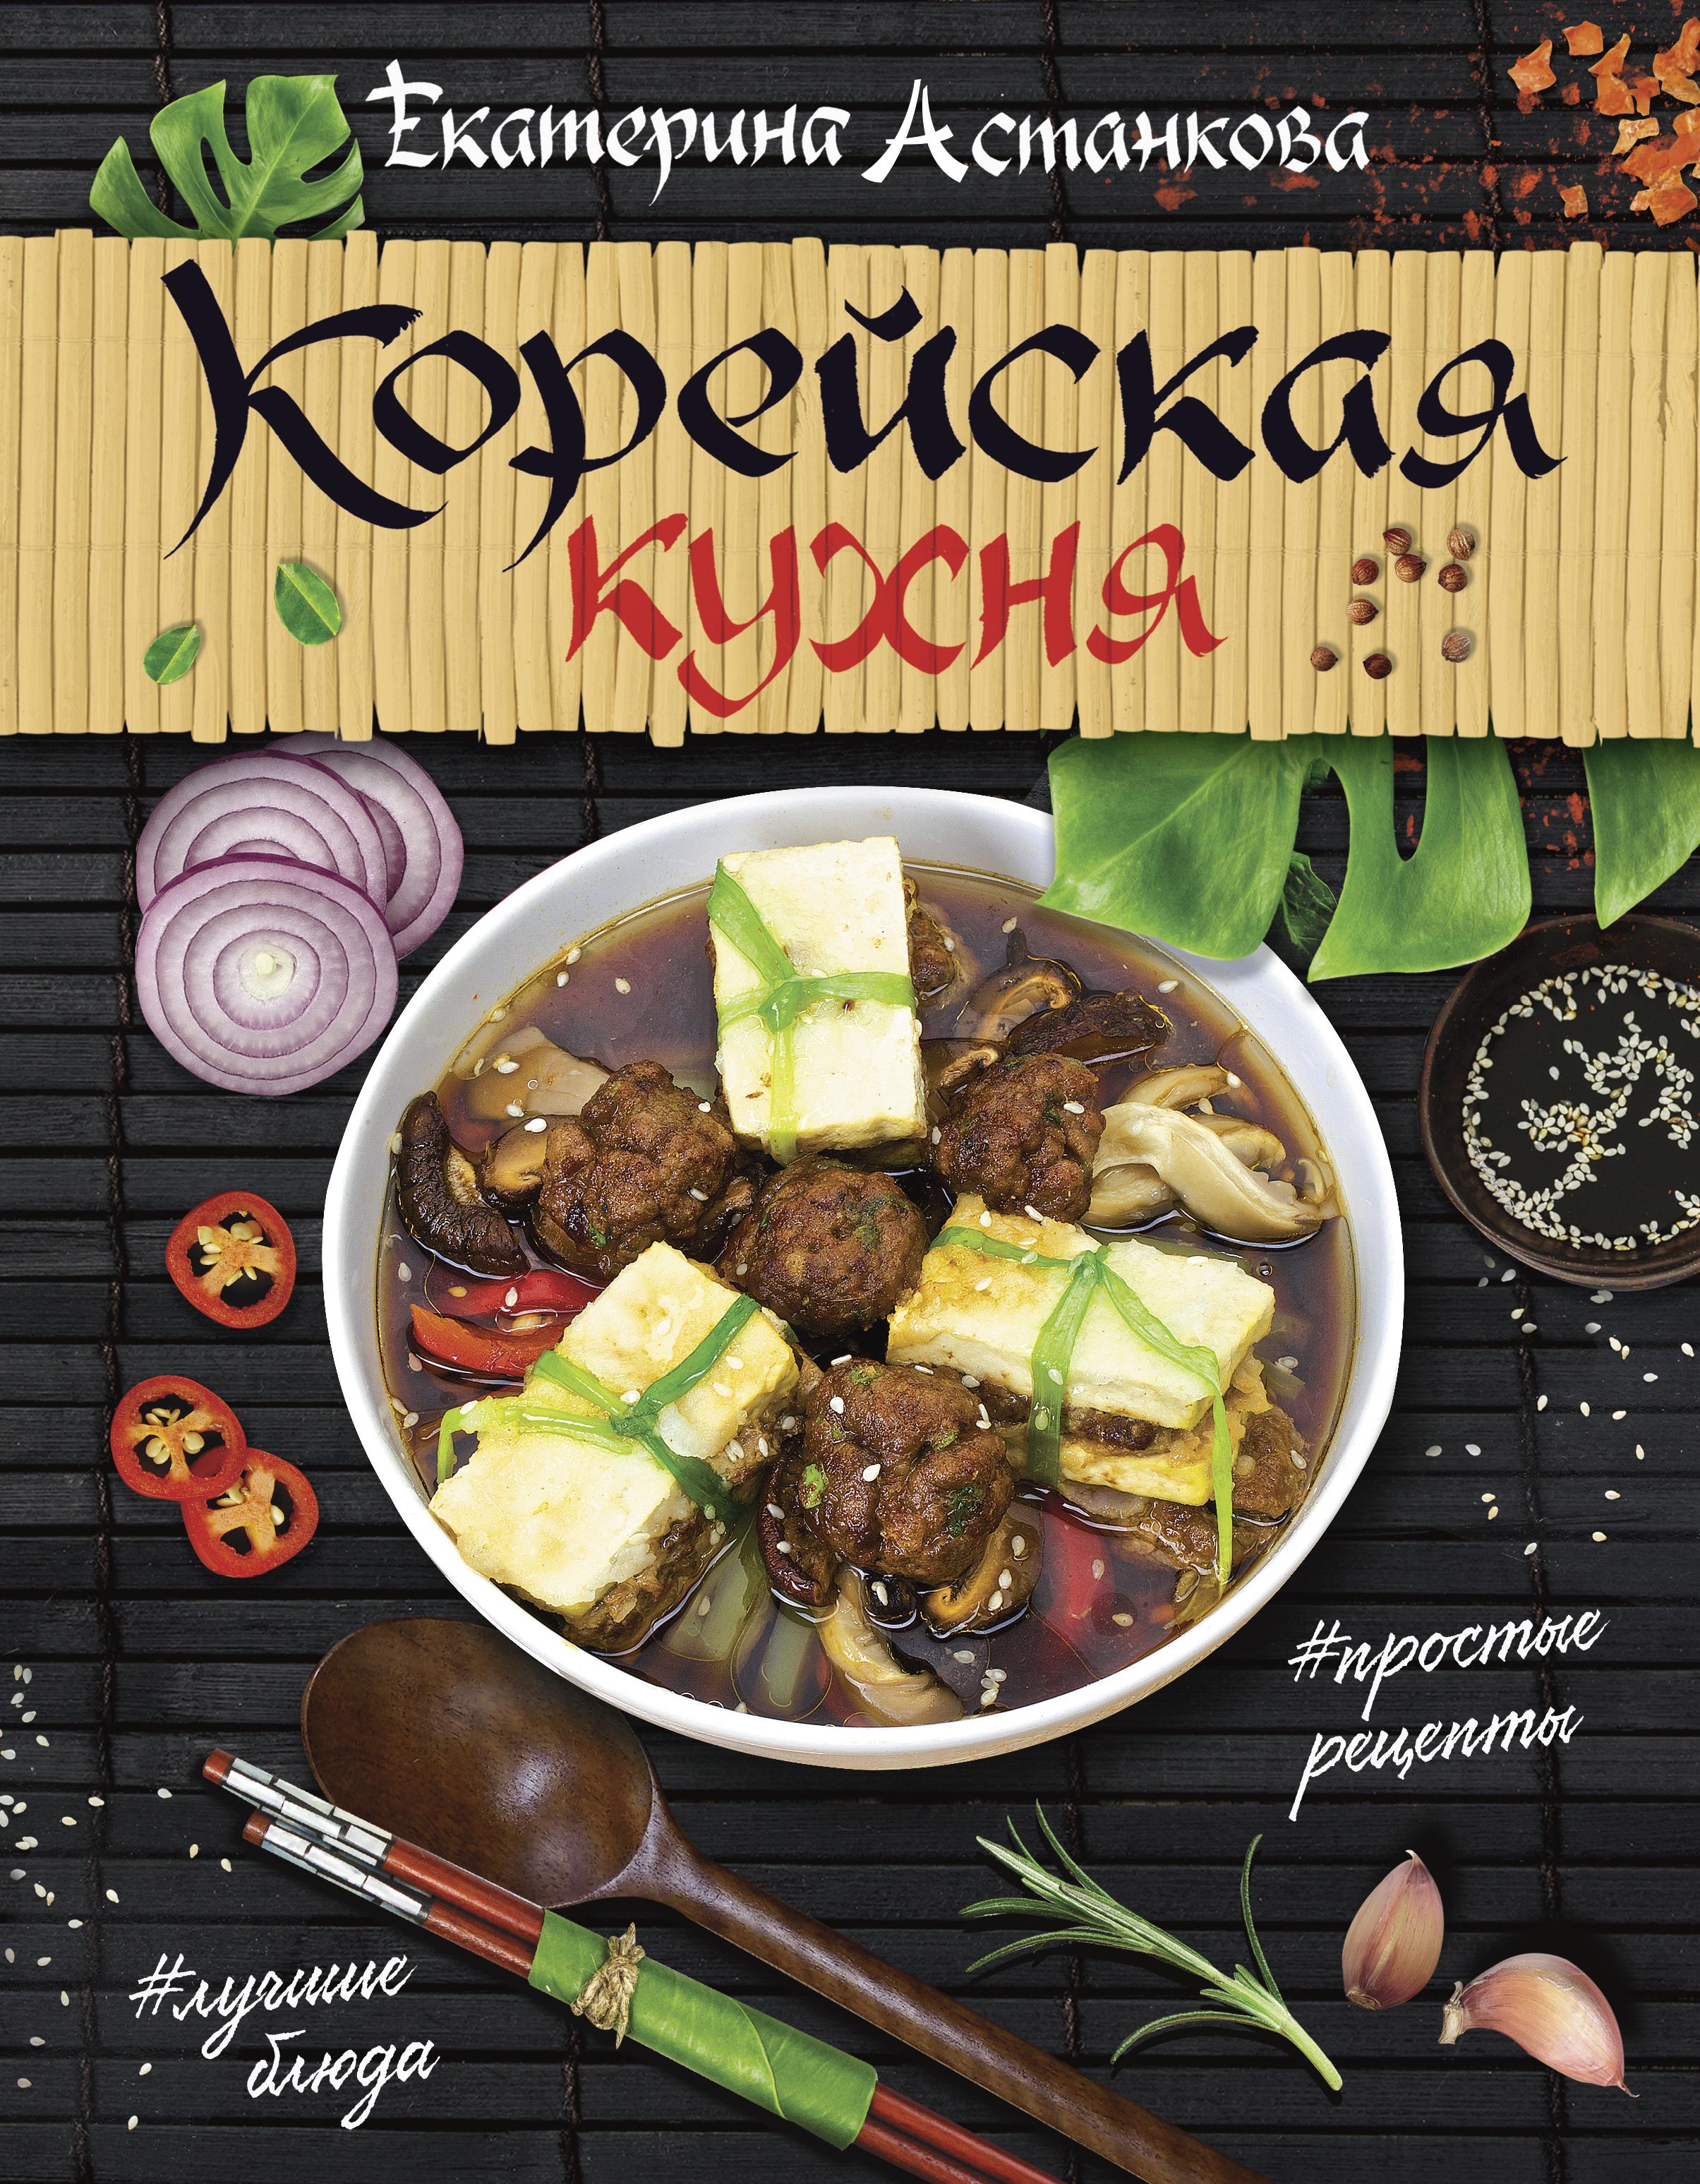 Астанкова Екатерина Корейская кухня